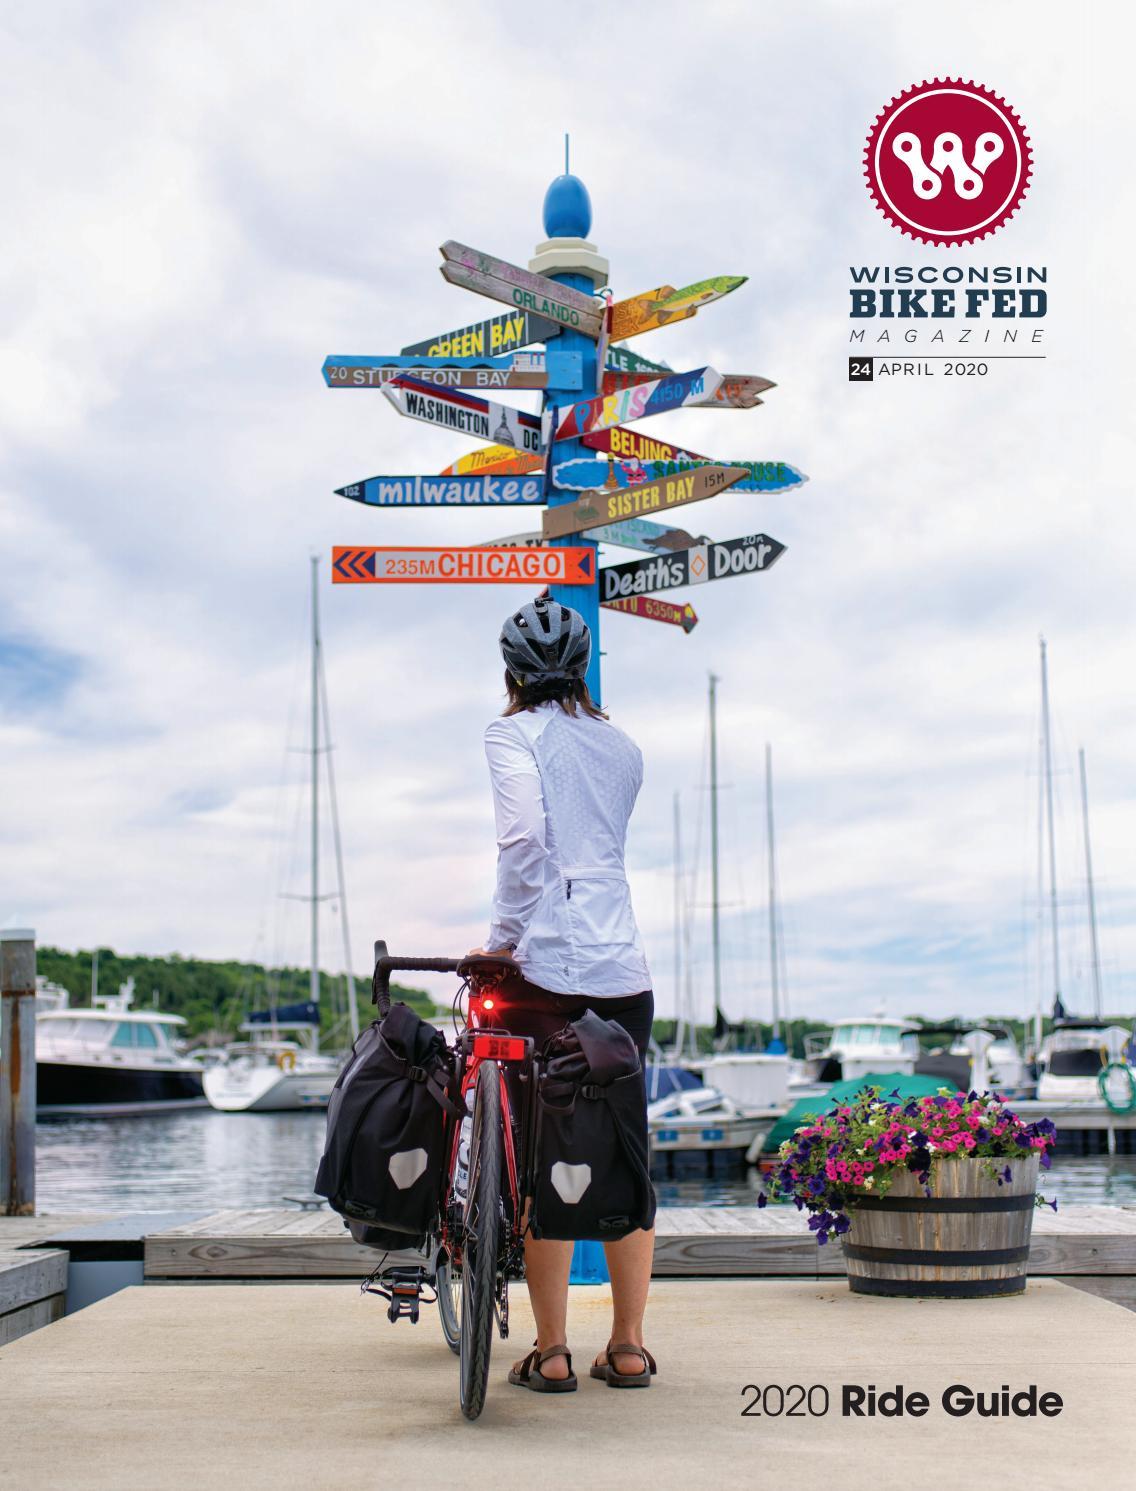 Wisconsin Bike Fed Magazine Ride Guide Edition Spring 2020 By Wisconsin Bike Fed Issuu